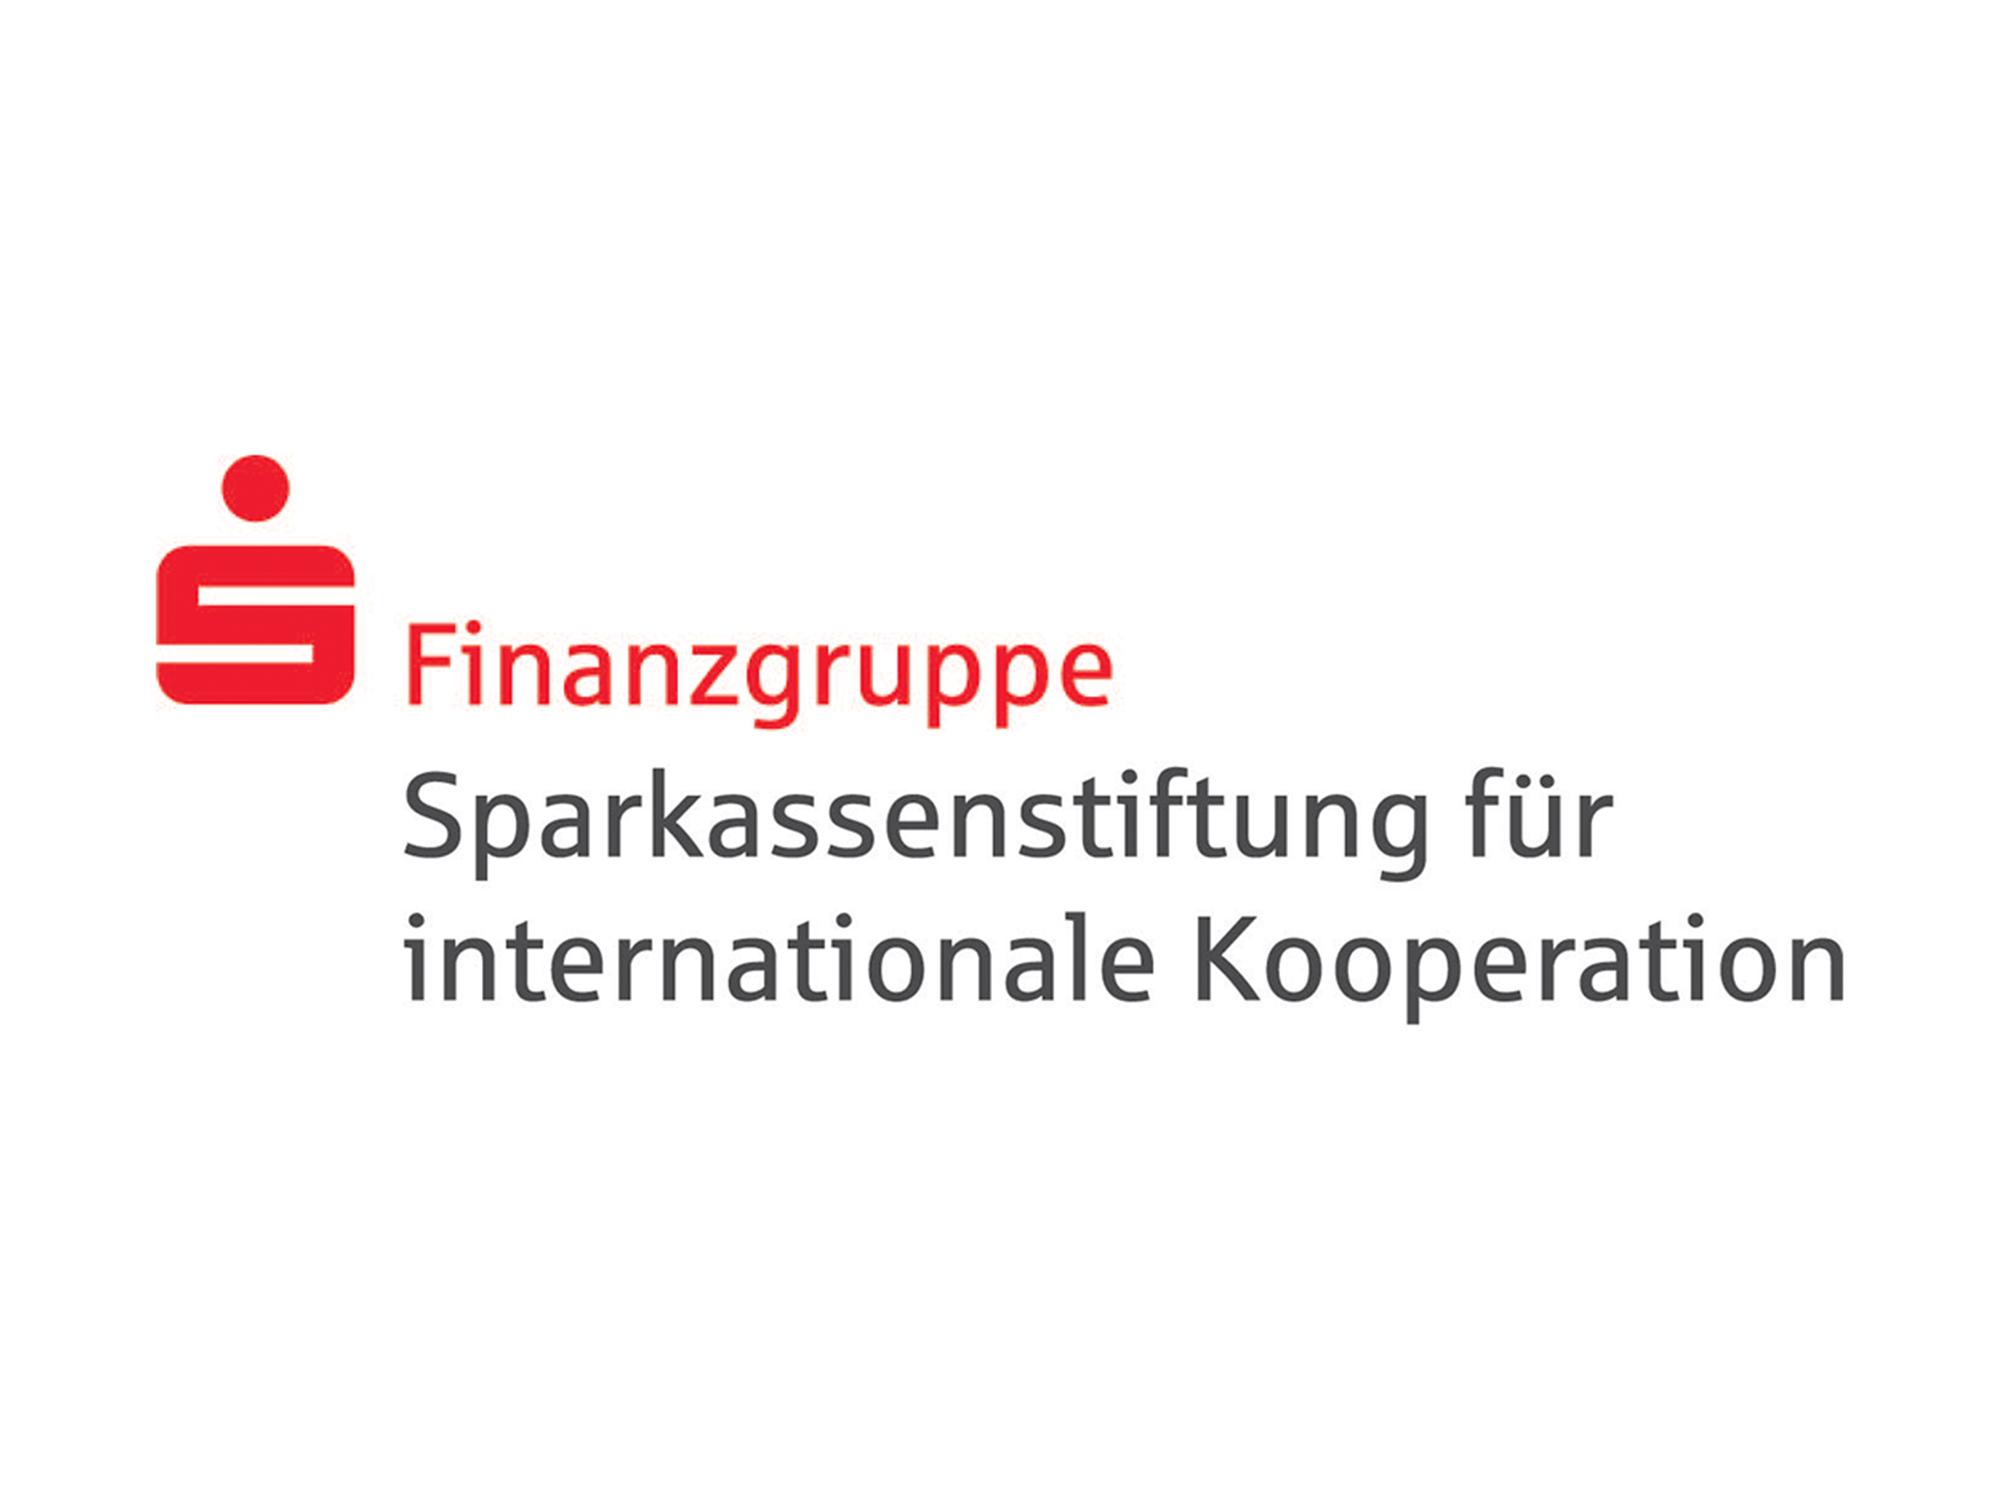 Logo - Finance Group - Financiadores - Findepro